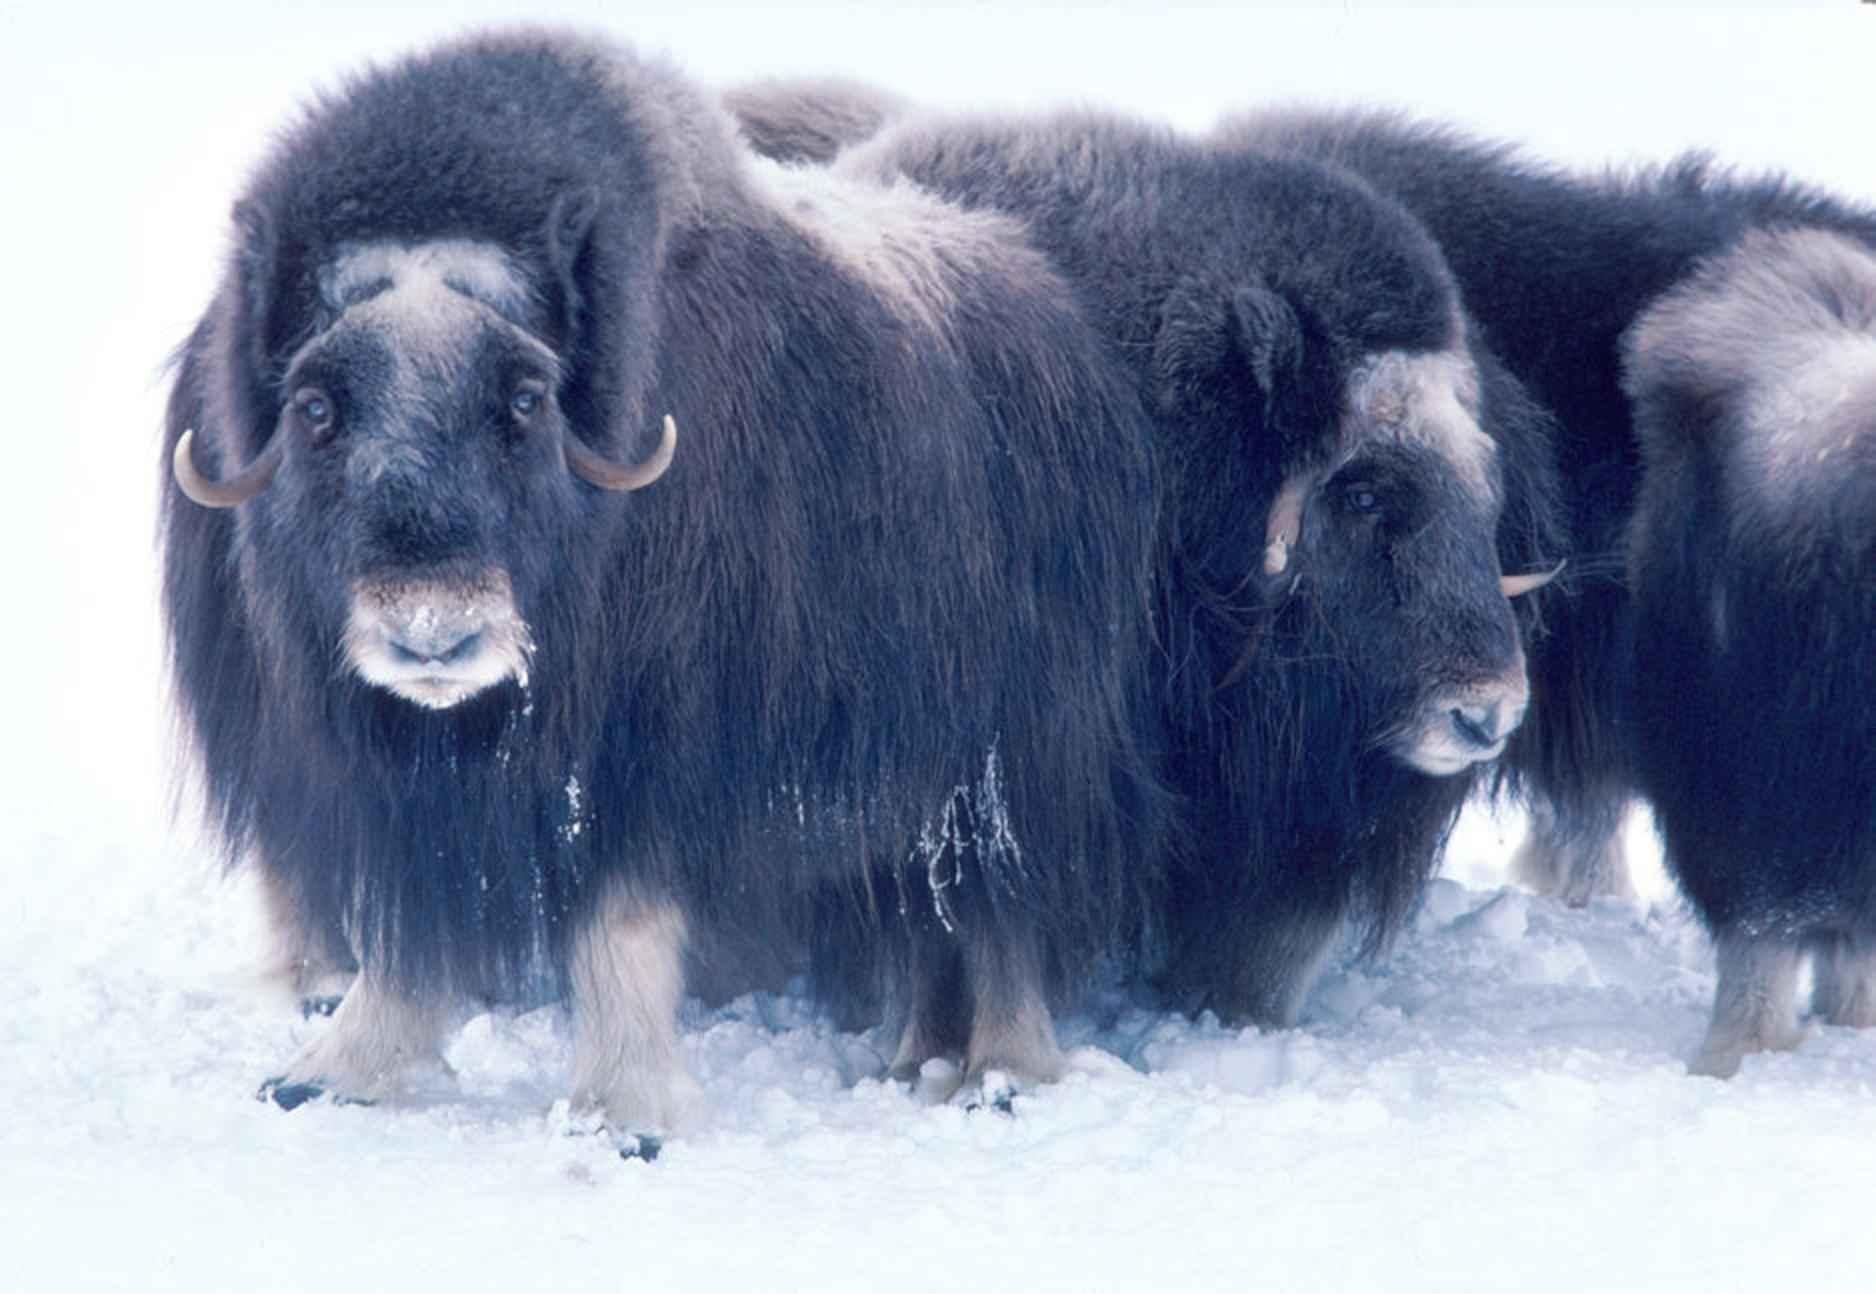 Adult musk ox bulls animals | [public domain]